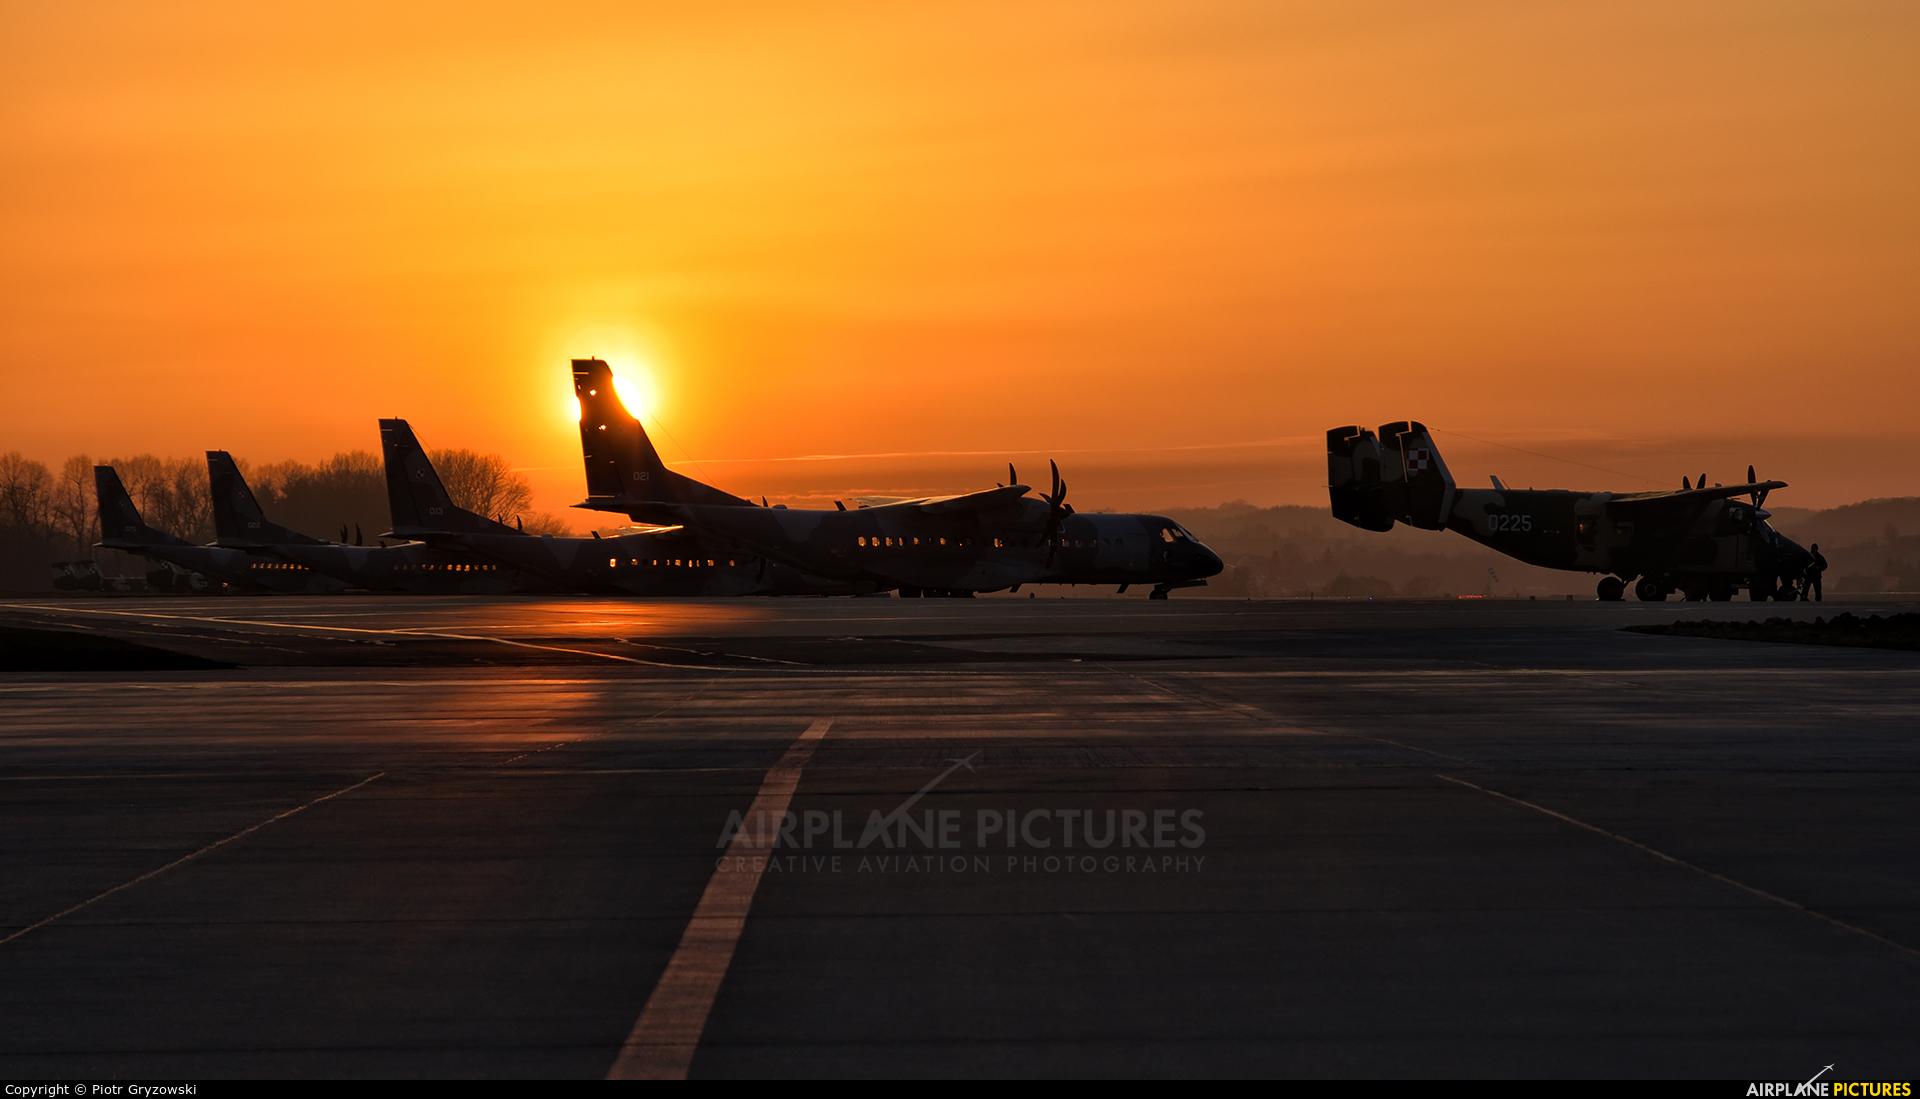 Poland - Air Force 0225 aircraft at Kraków - John Paul II Intl